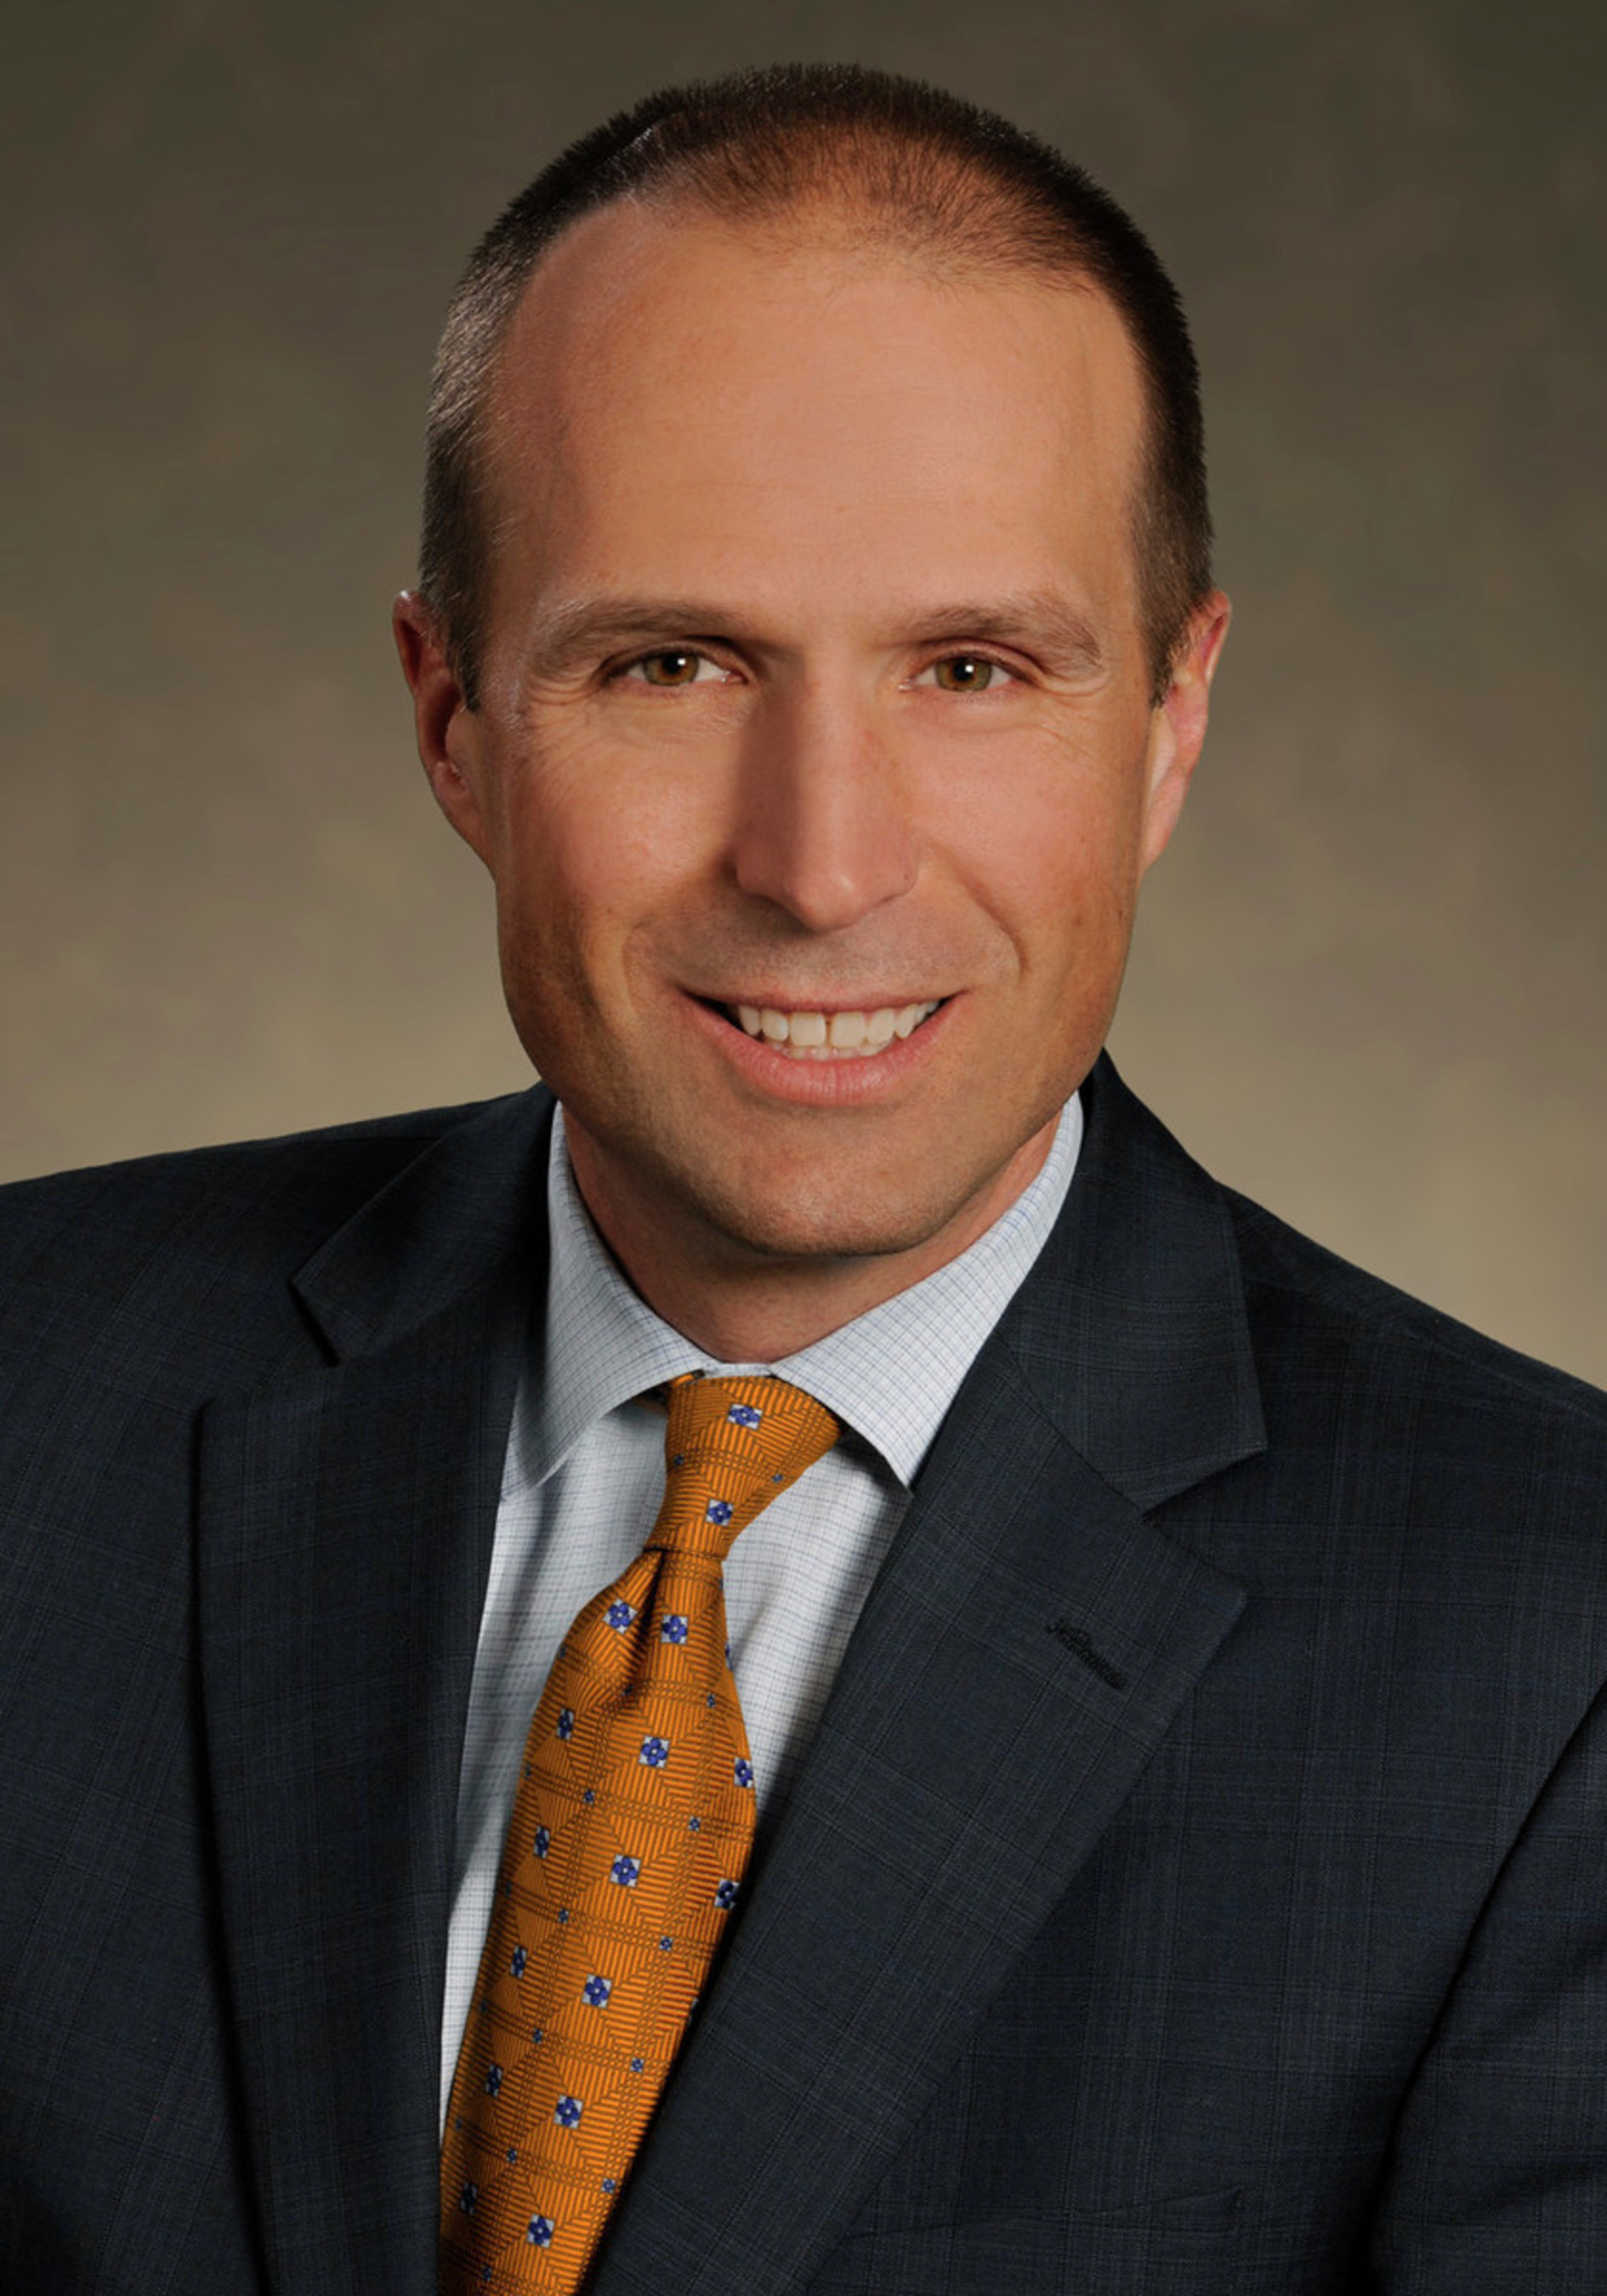 Richard Hammett, President and CEO of Swedish Medical Center